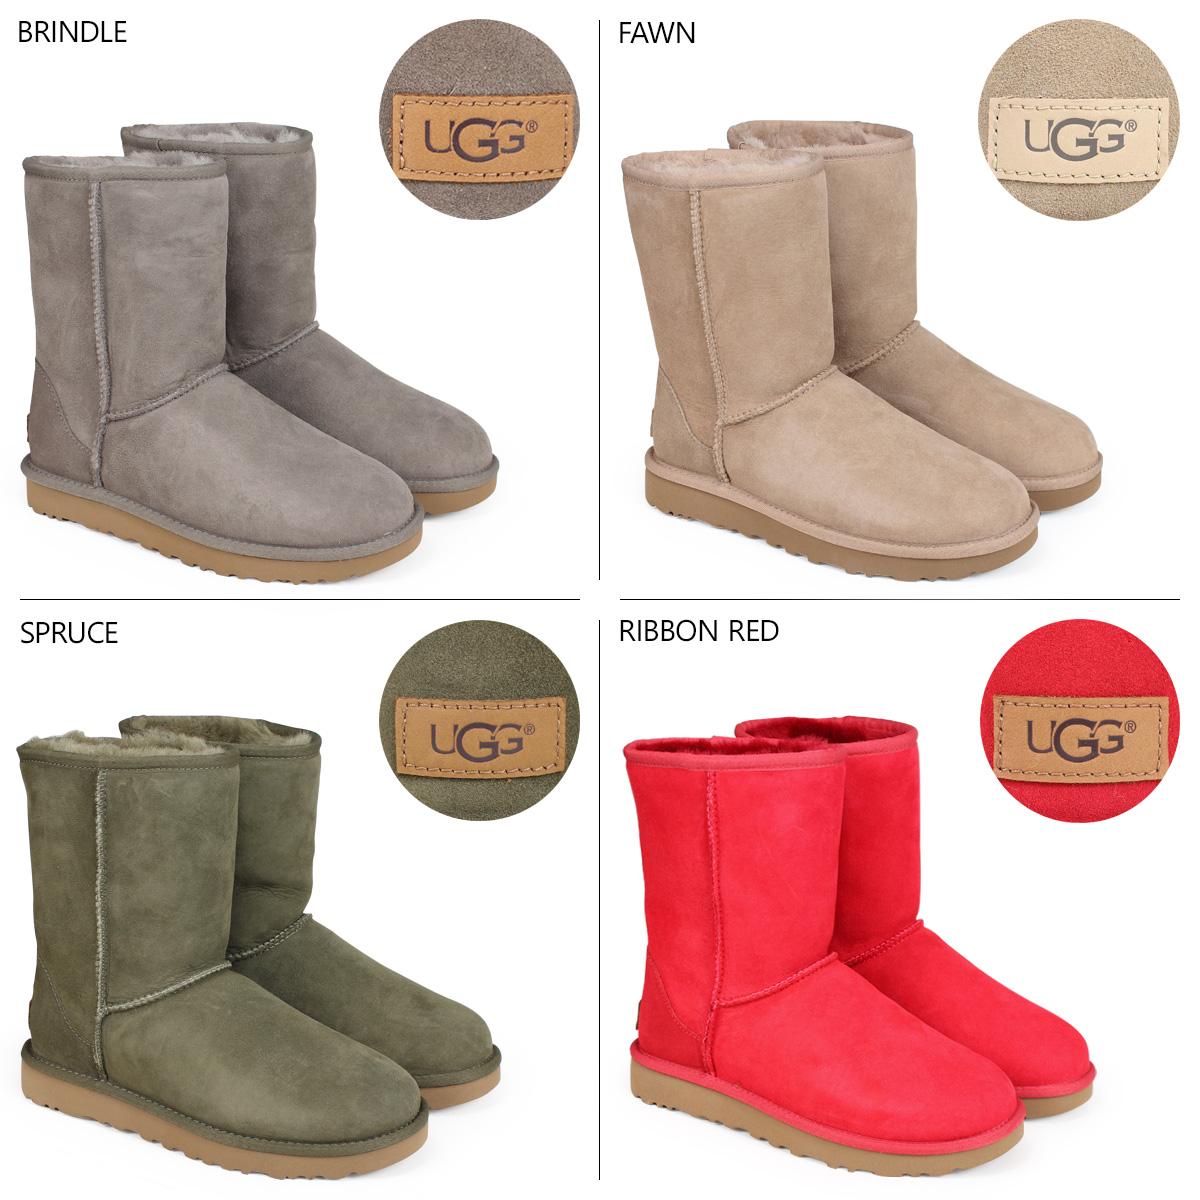 2151136aad2 アグ UGG mouton boots Lady's classical music short 2 WOMENS CLASSIC SHORT II  5825 1016223